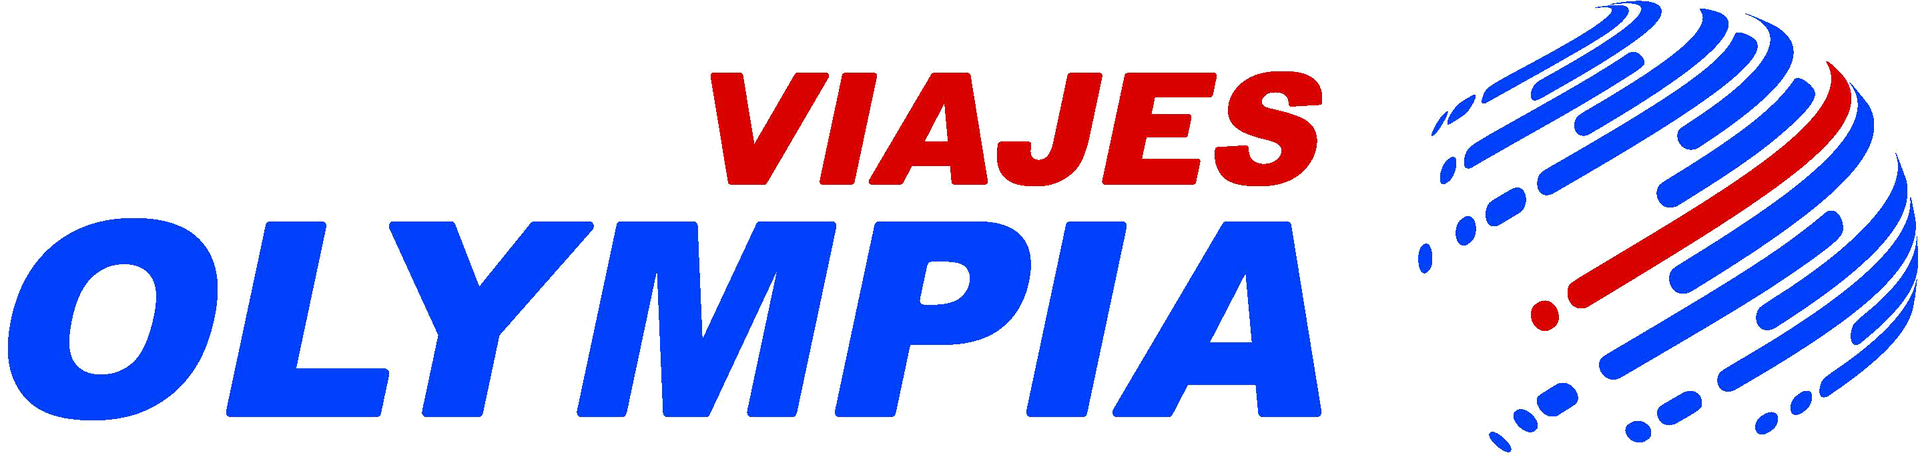 Logo Viajes Olympia.png